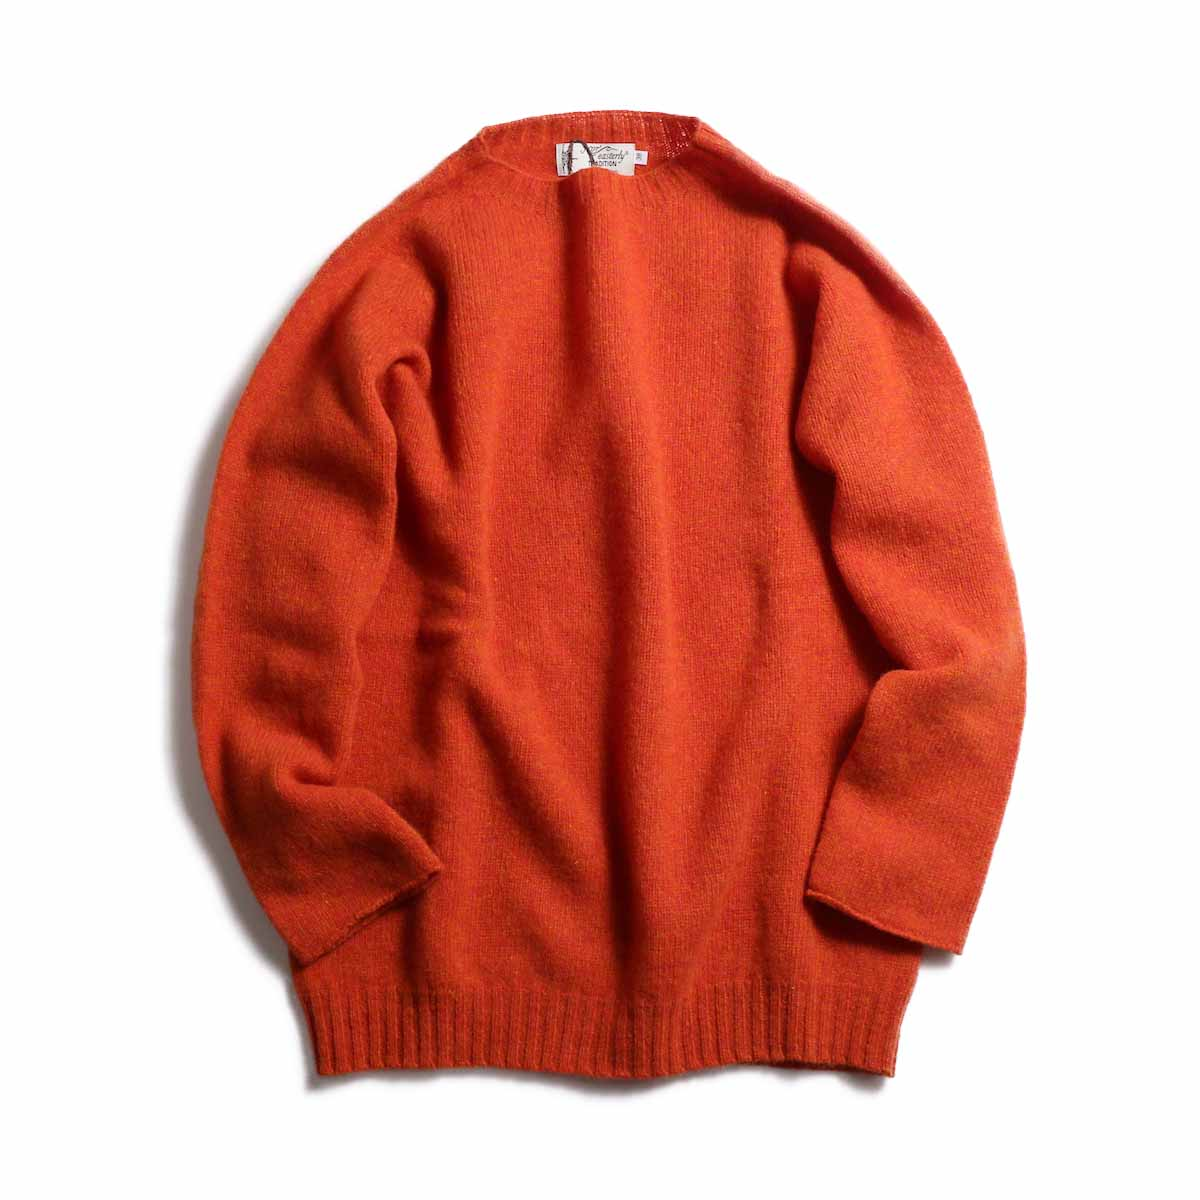 NOR'EASTERLY / L/S Crew Neck Knit -ORANGE